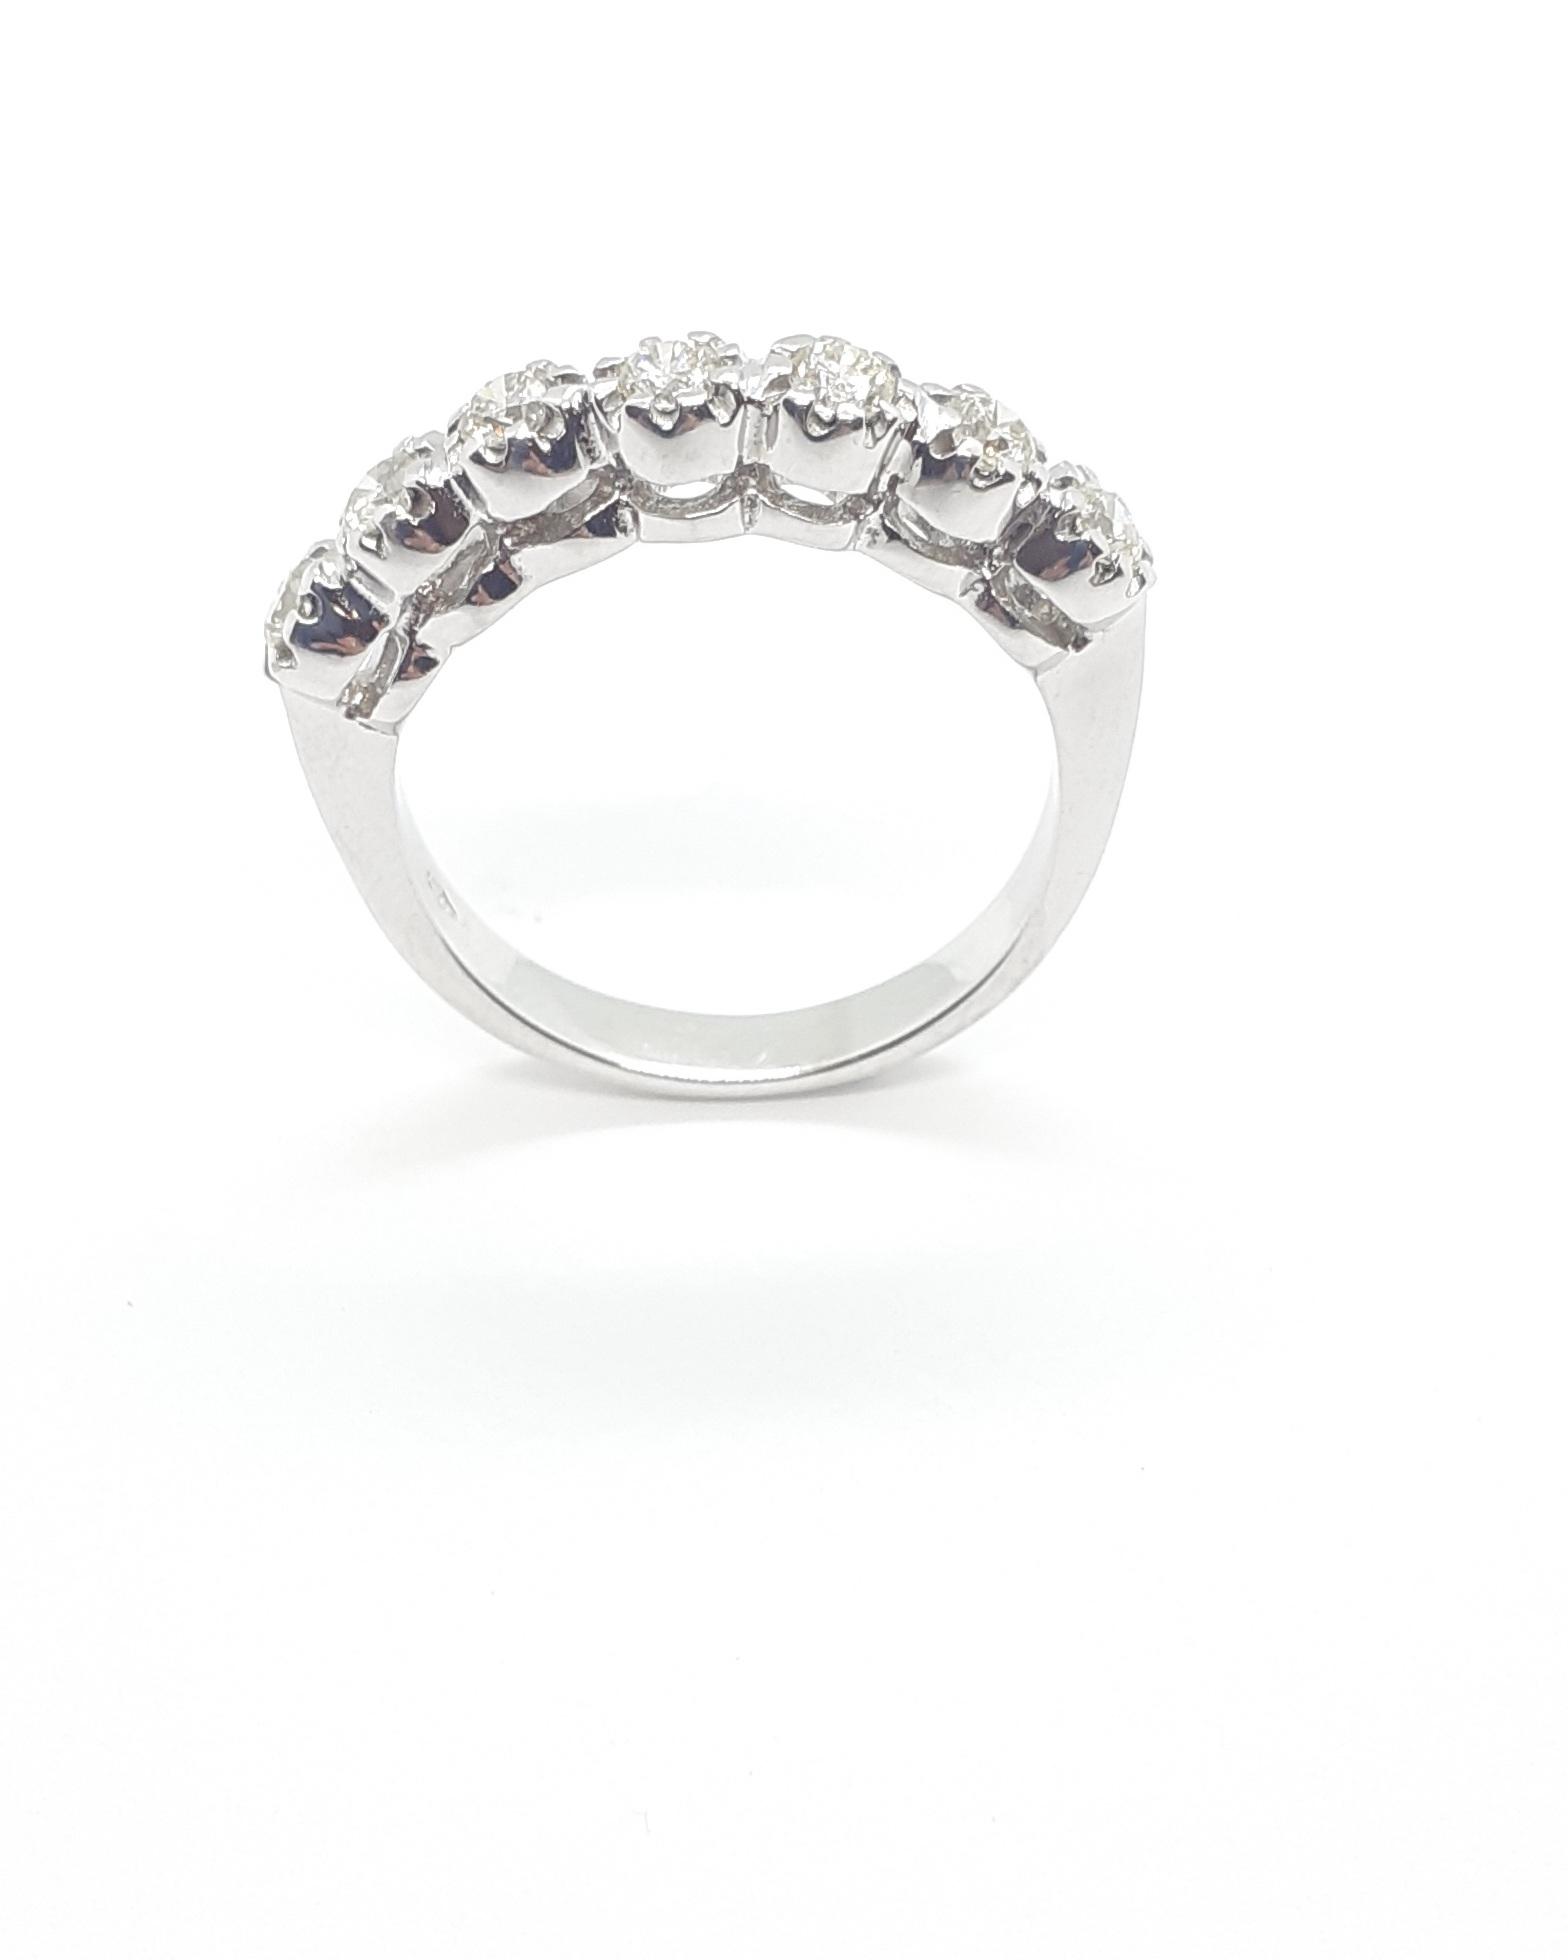 Sensi joyas jewellery Granada silver engagementDIAMONDS  RING  0,50 CTS